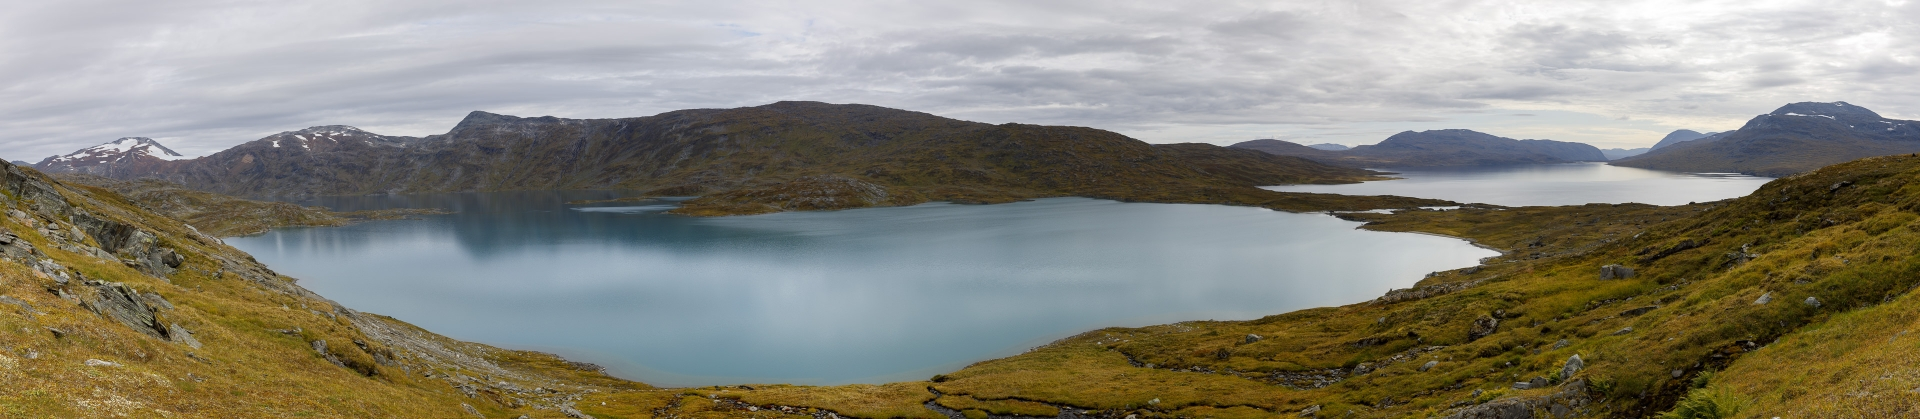 Panorama Bovrojávri und Kåbtåjaure